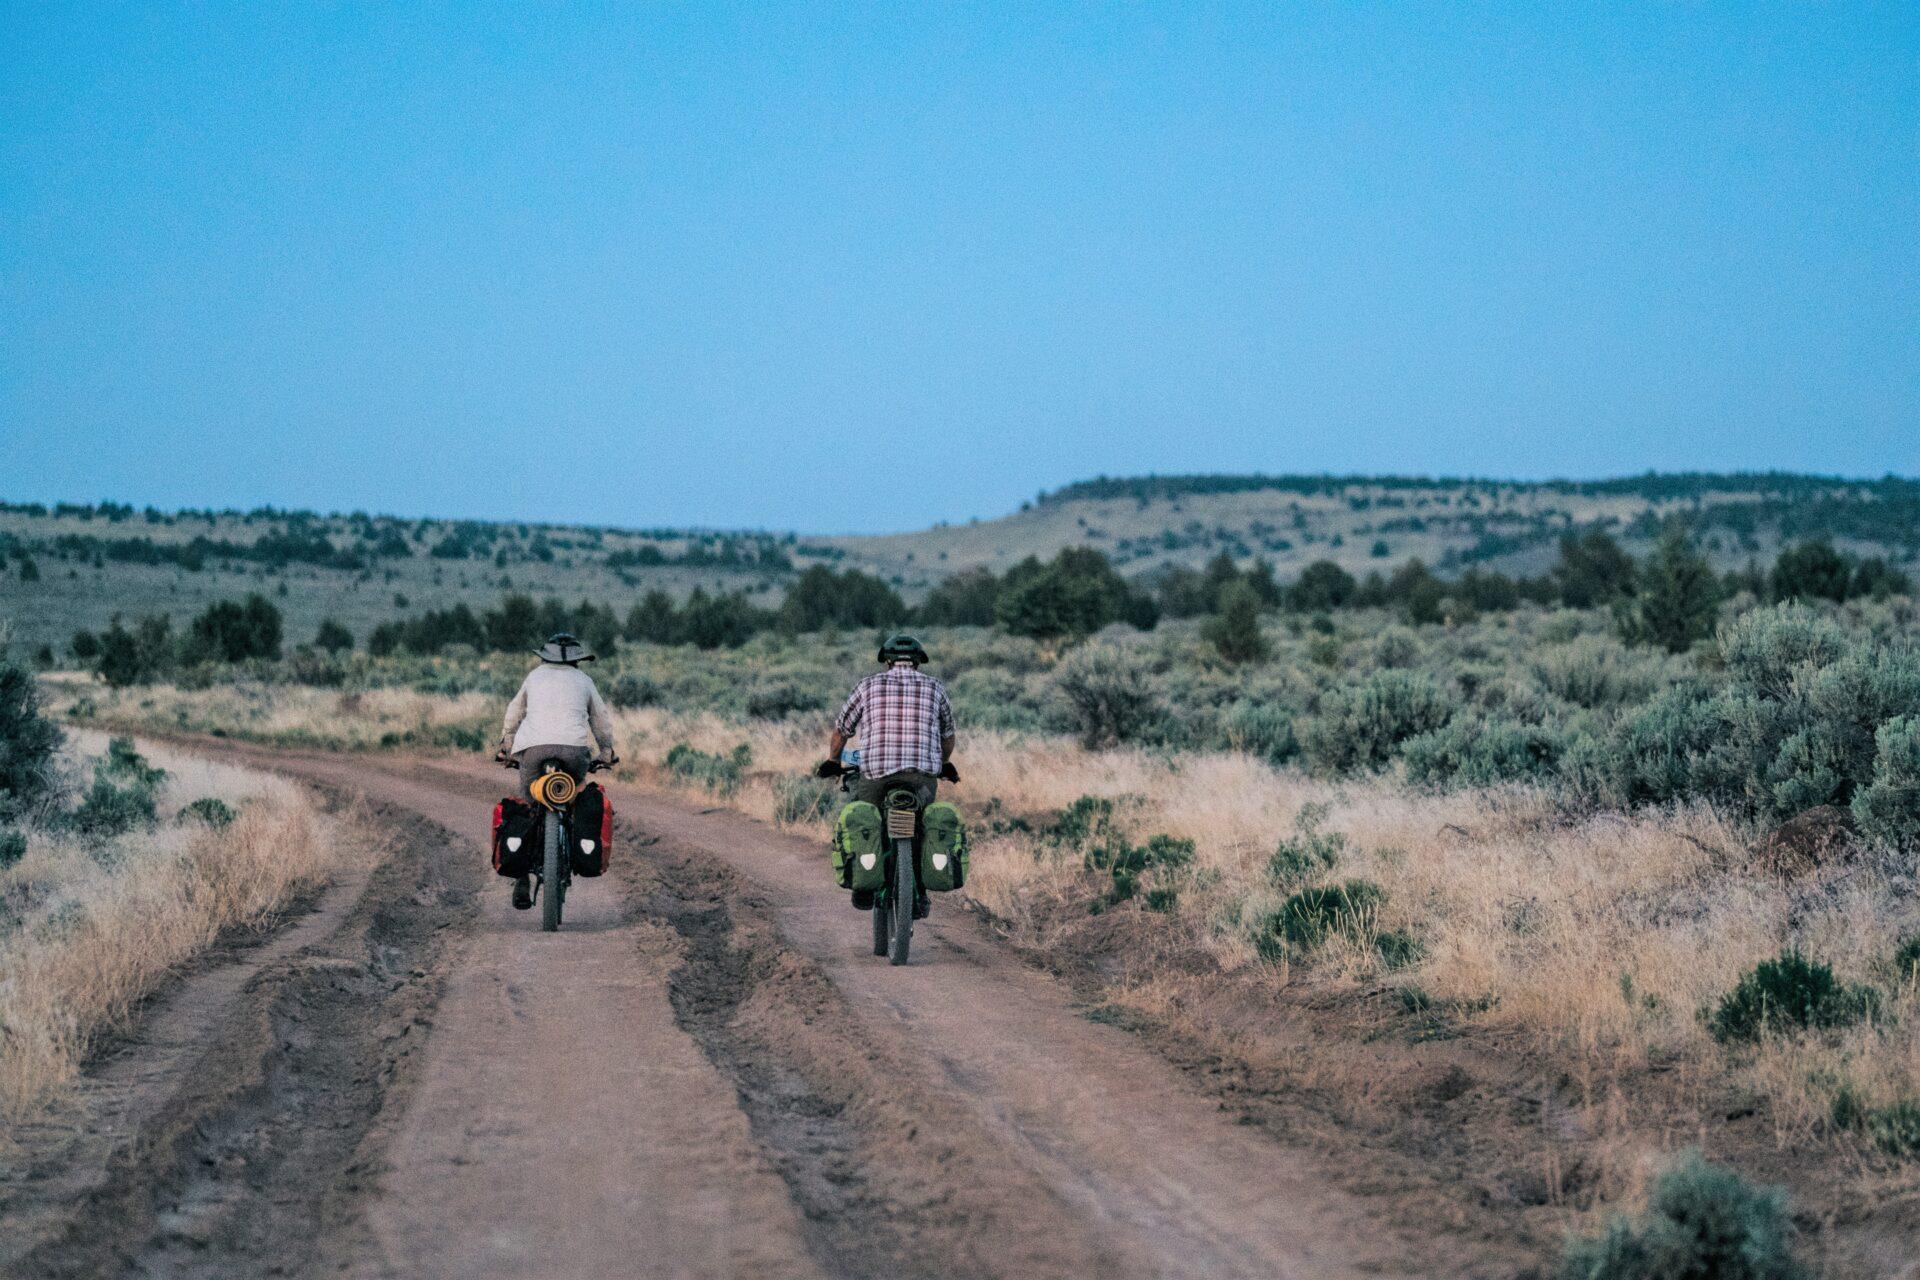 Biking dirt road up the shoulder of Steens Mountain, alongside sagebrush.